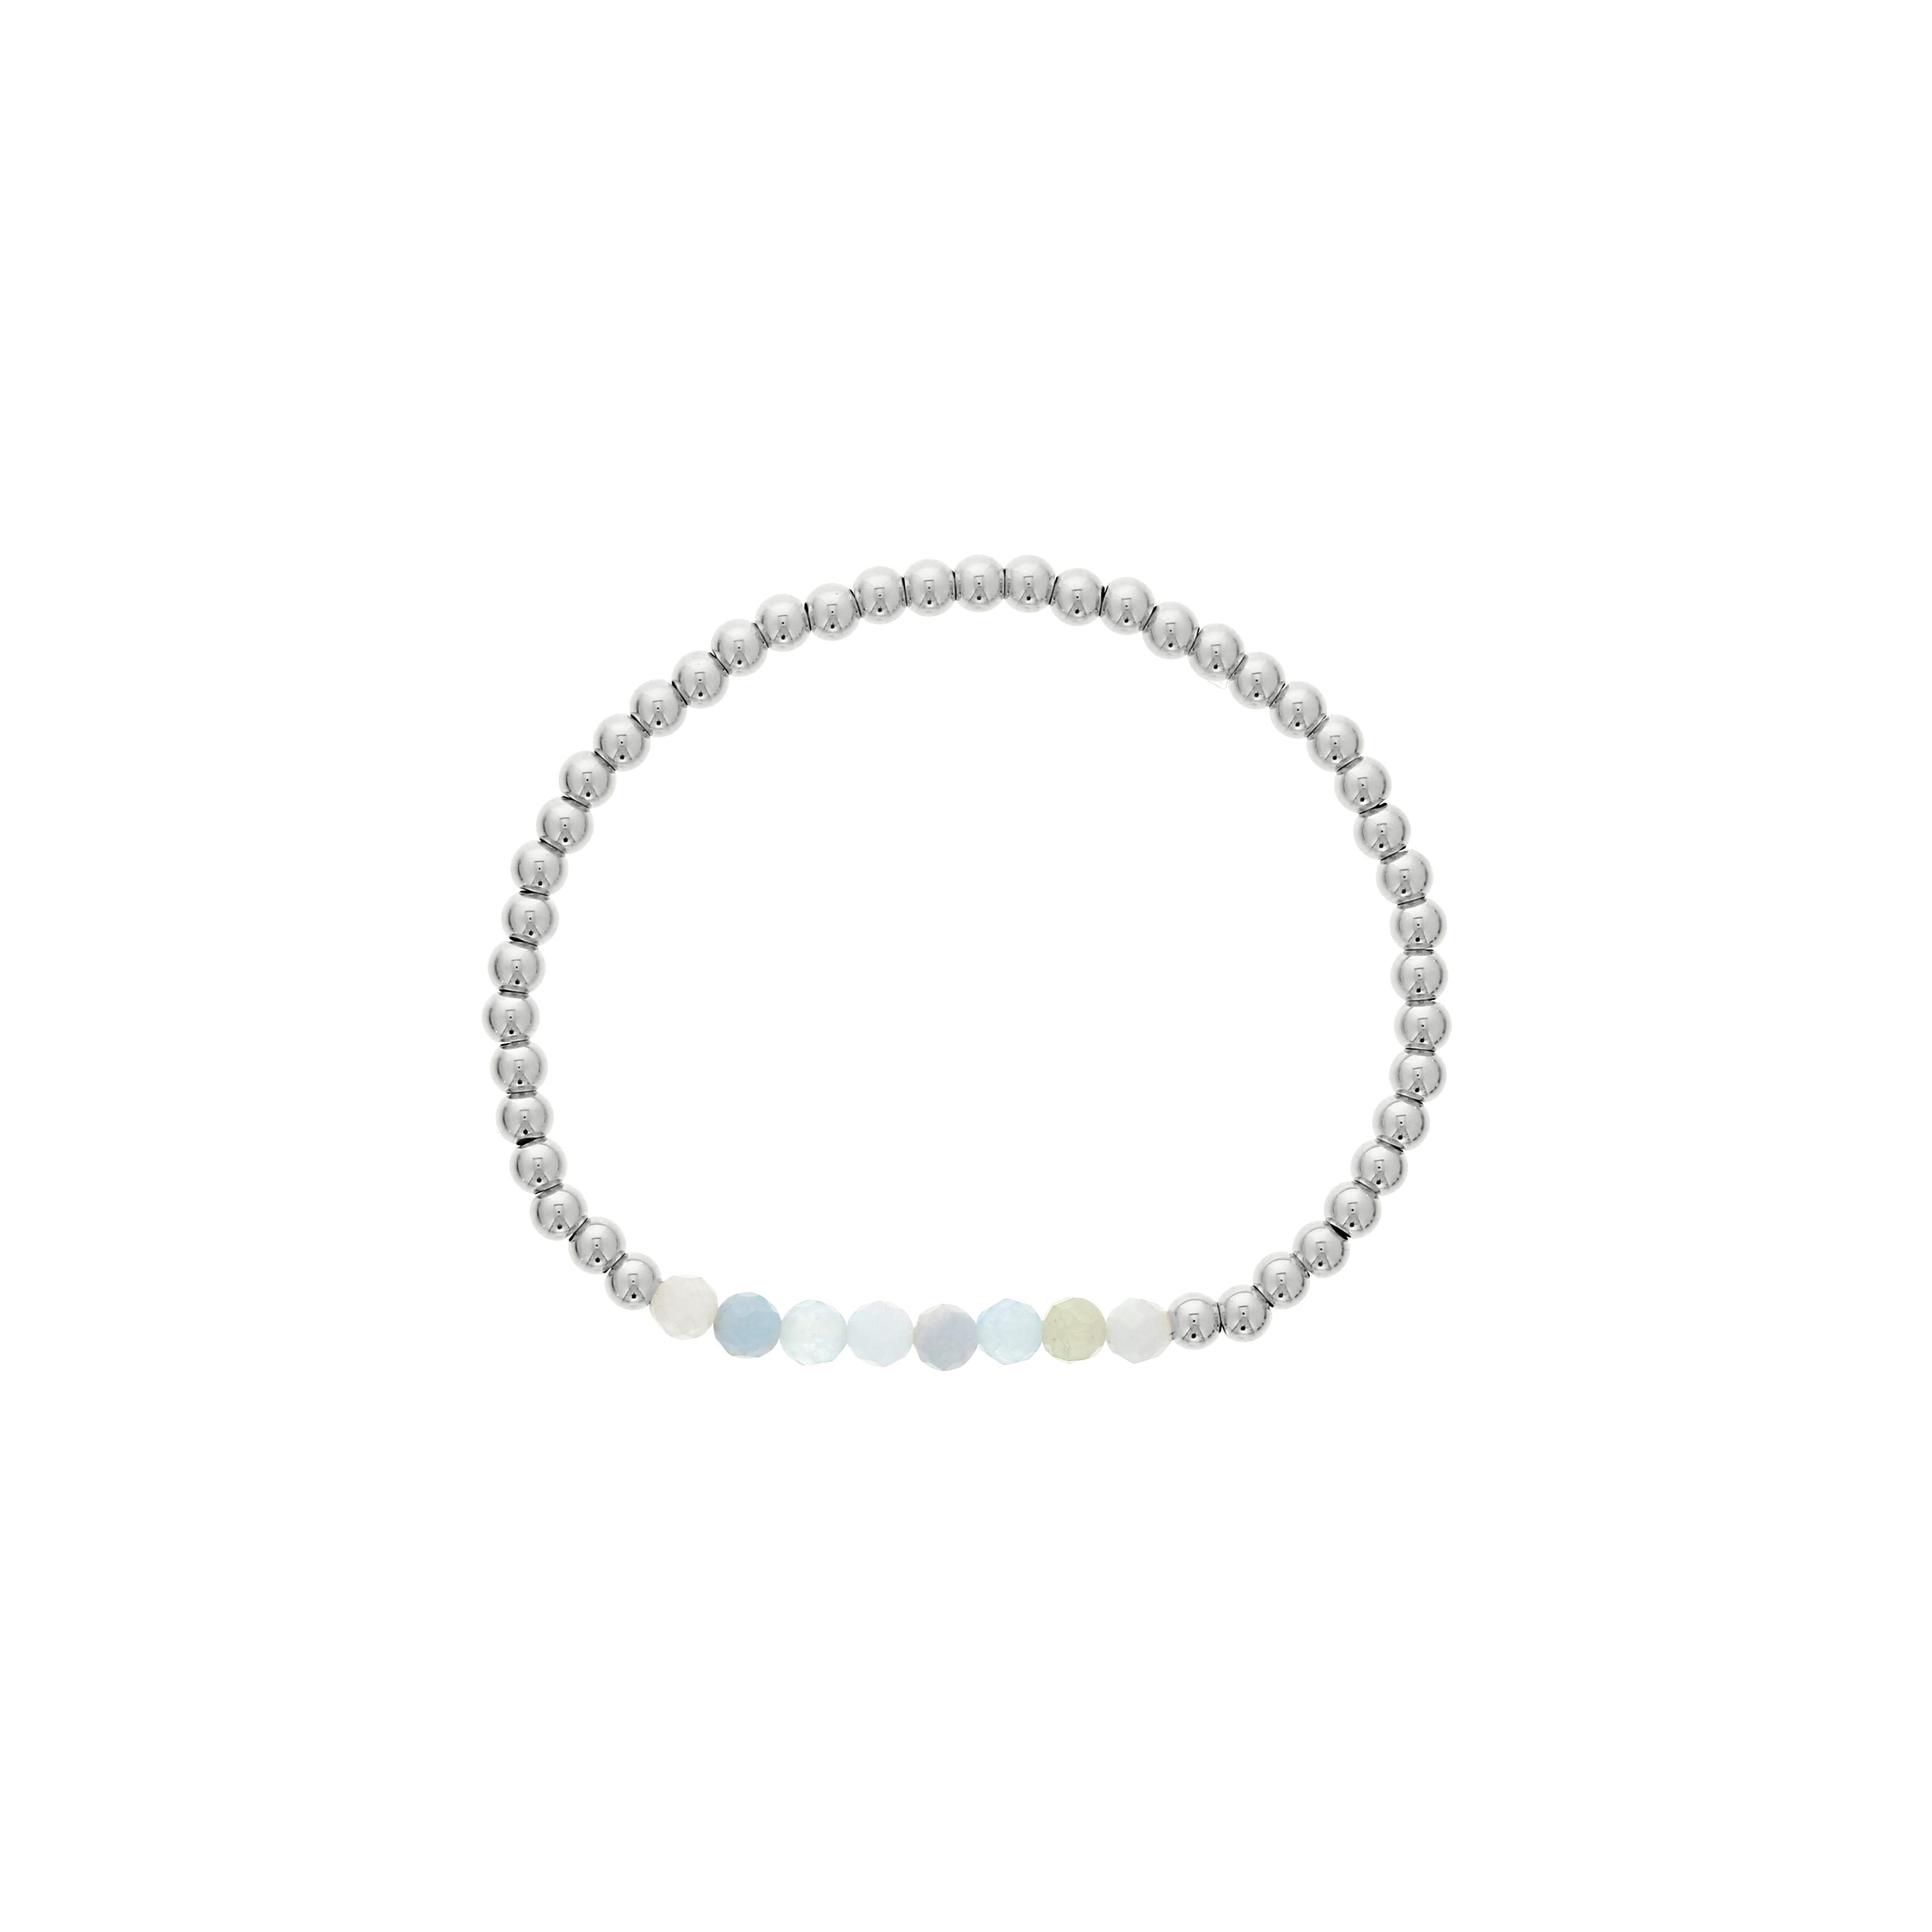 Aquamarine Birthstone Beaded Bracelet in Sterling Silver